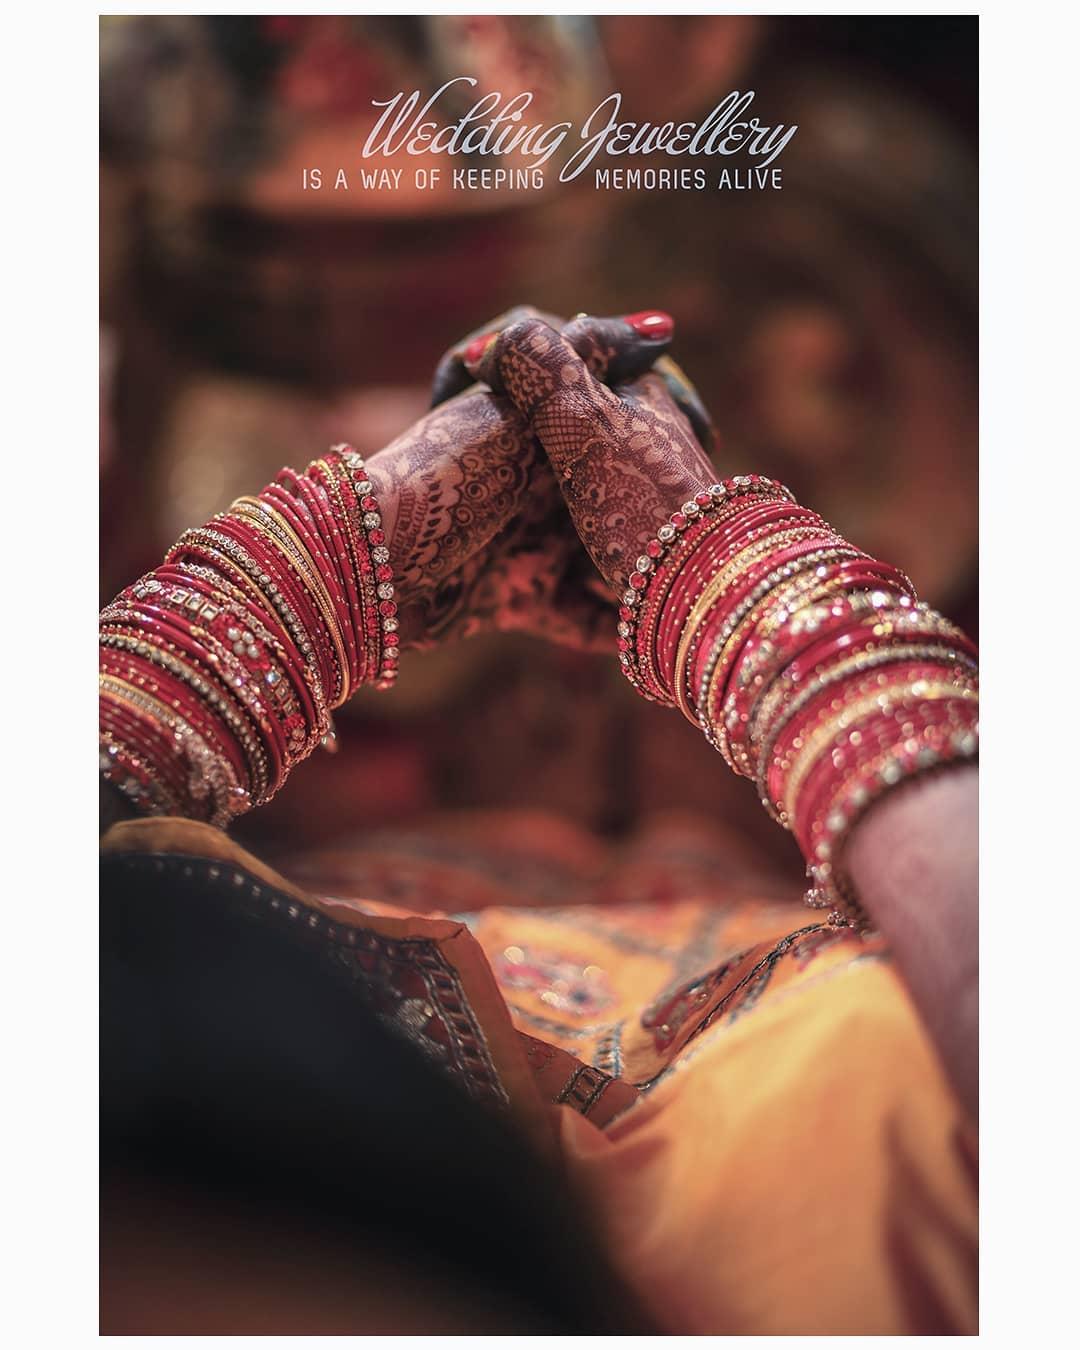 Dip Memento Photography,  Jewellery...., hinduwedding, bride, hinduweddingphotographer, weddingphotography, bridetobe, coupleshoot, haldifunction, bridal, brideandgroom, beautifulbride, bridal, haldi, groom, groomandbride, groomandgroom, beautifulfoodforyou., celebration, weddingsku, weddingsutra, weddingseason, BetterTogether, beautifulbride, BetterTogether, brideandgroom